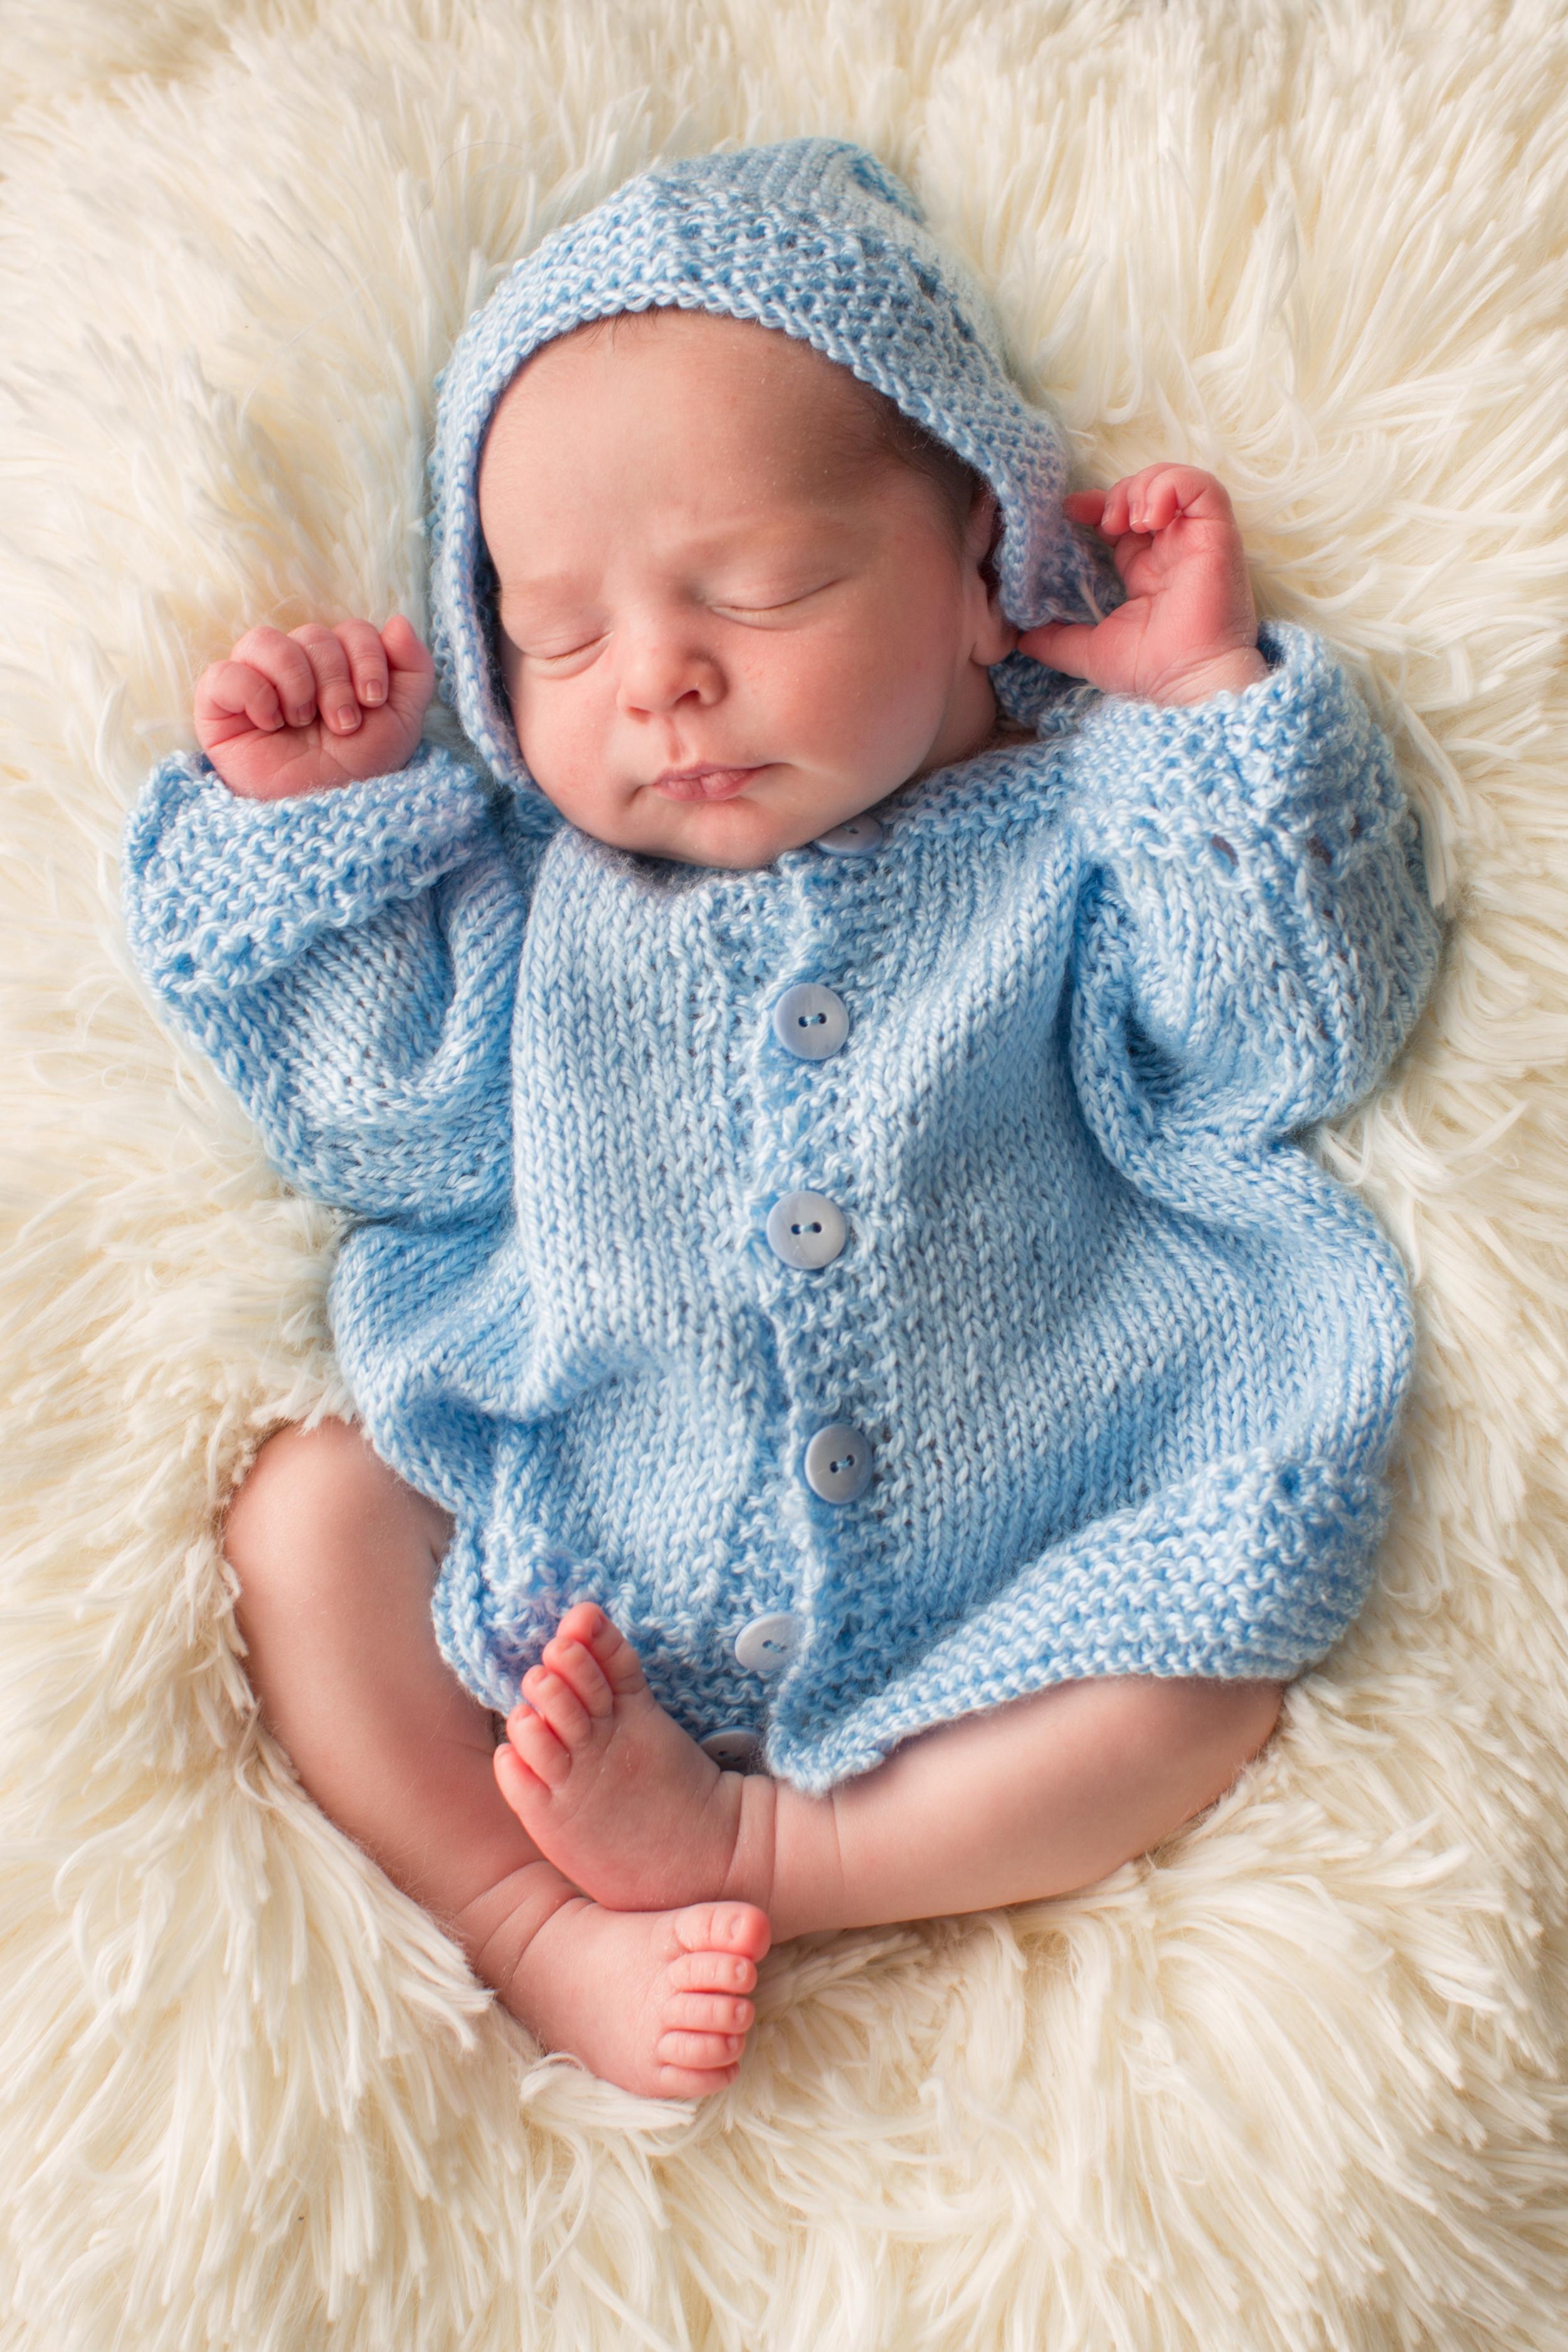 newborn baby in blue .jpg